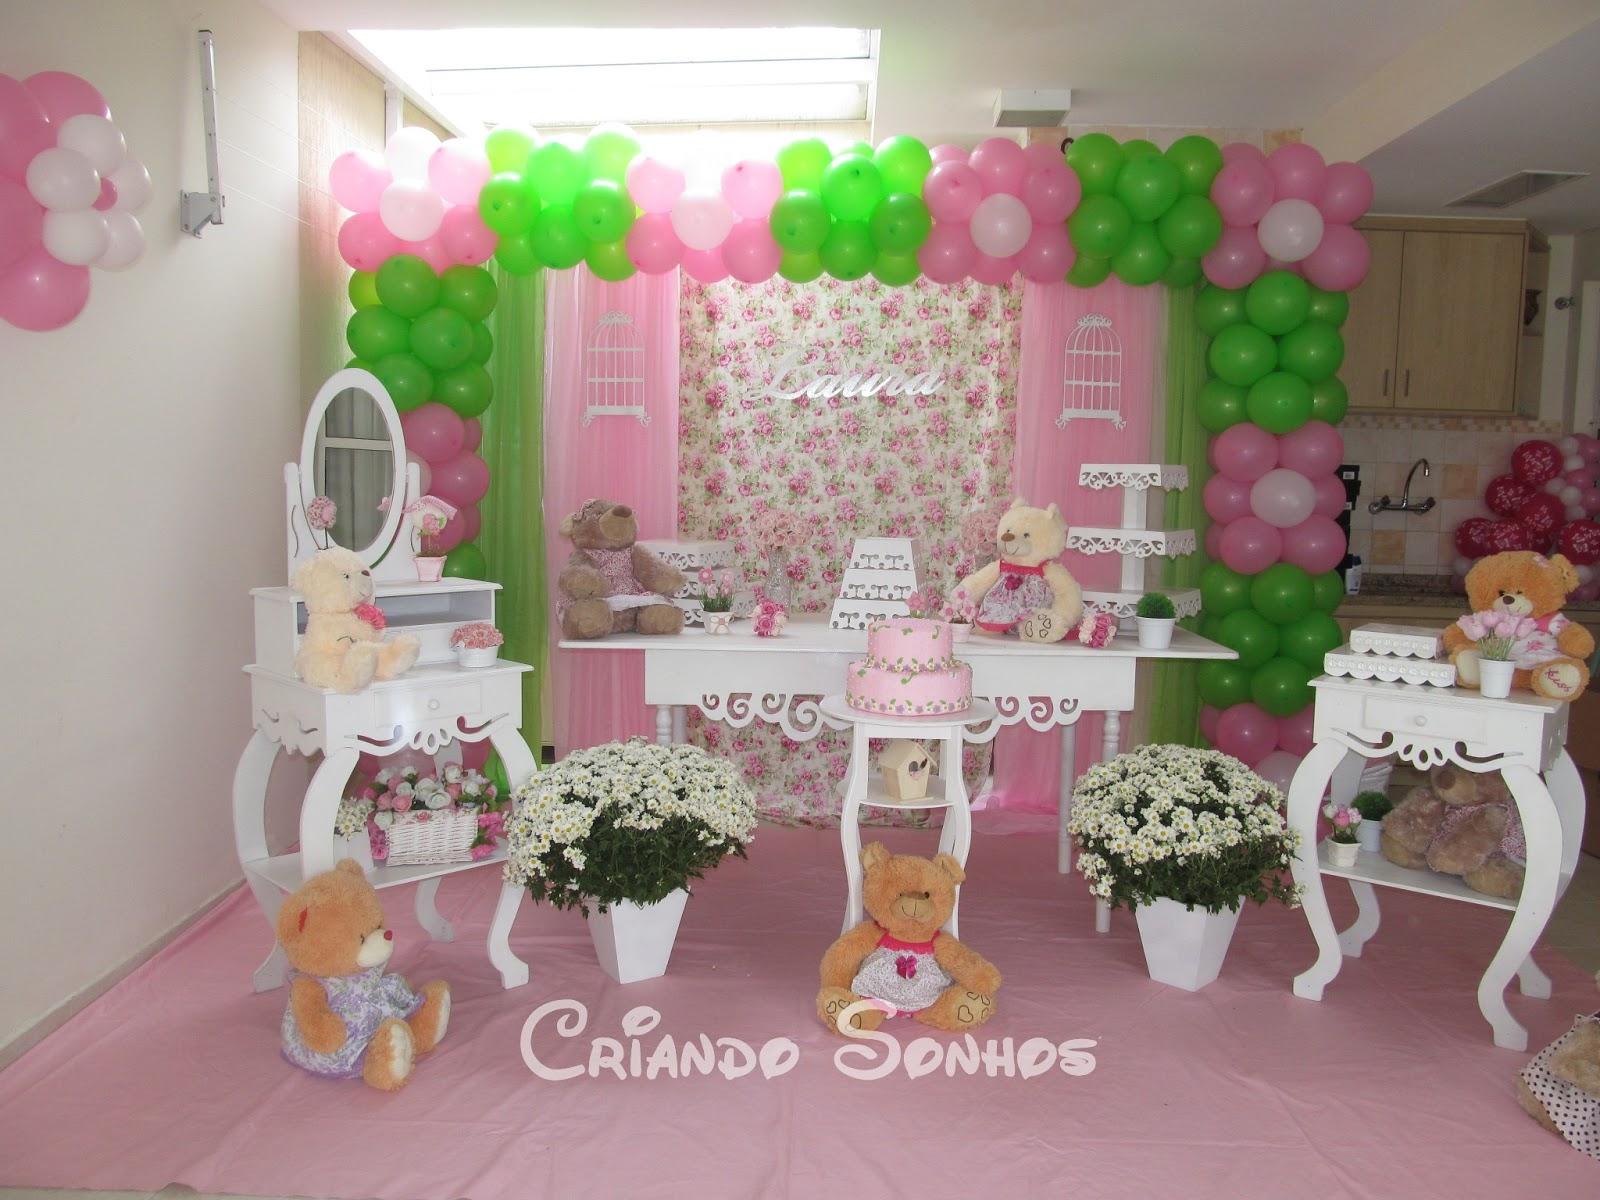 decoracao jardim infantil:Decoracao De Festa Infantil